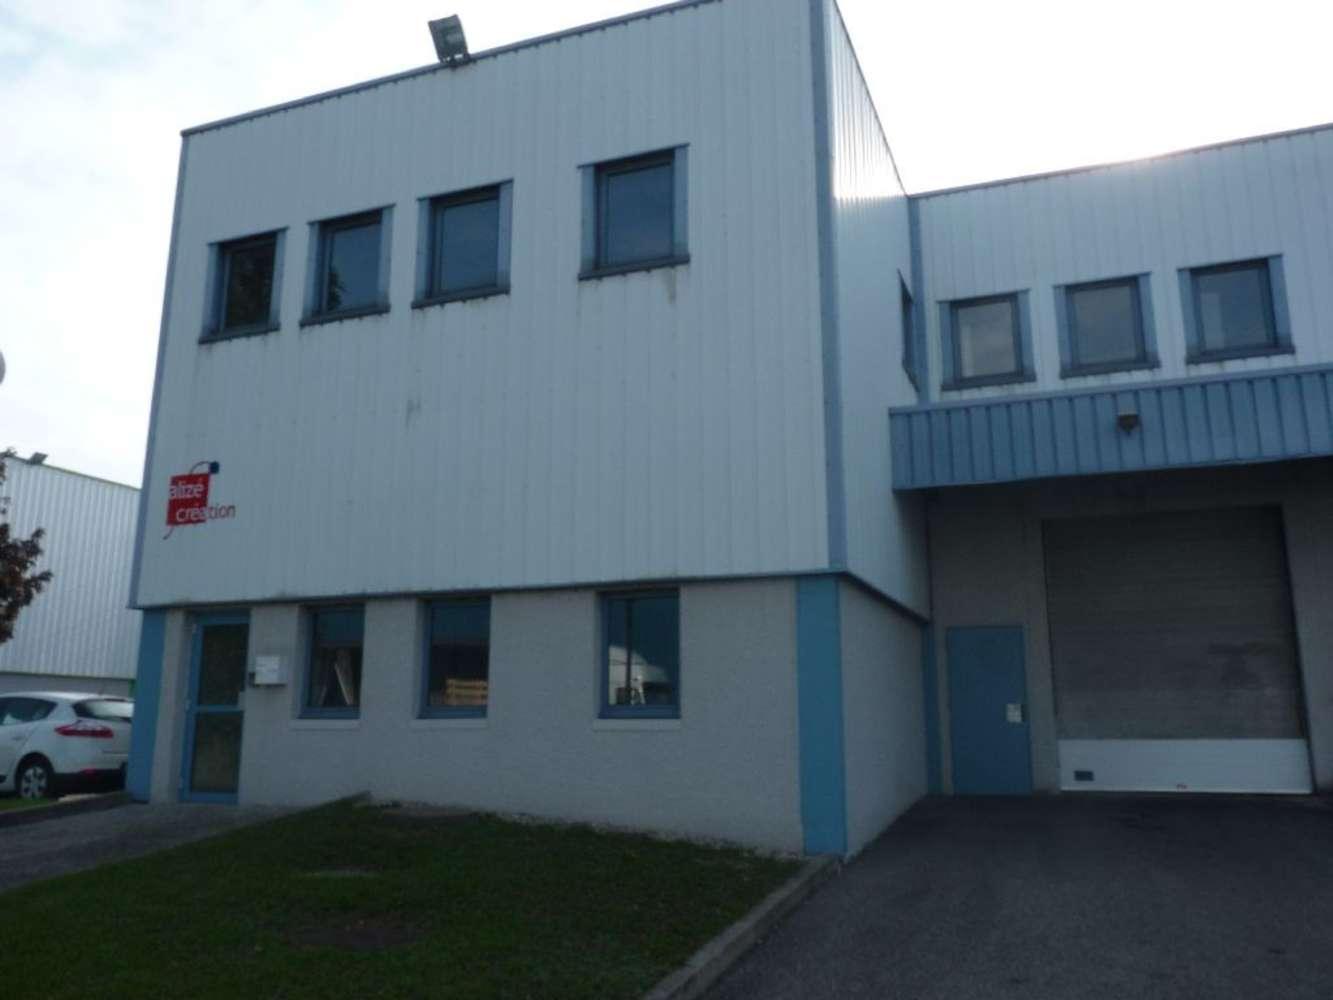 Activités/entrepôt Genas, 69740 - Location entrepot Genas - Lyon Est (69) - 10322578